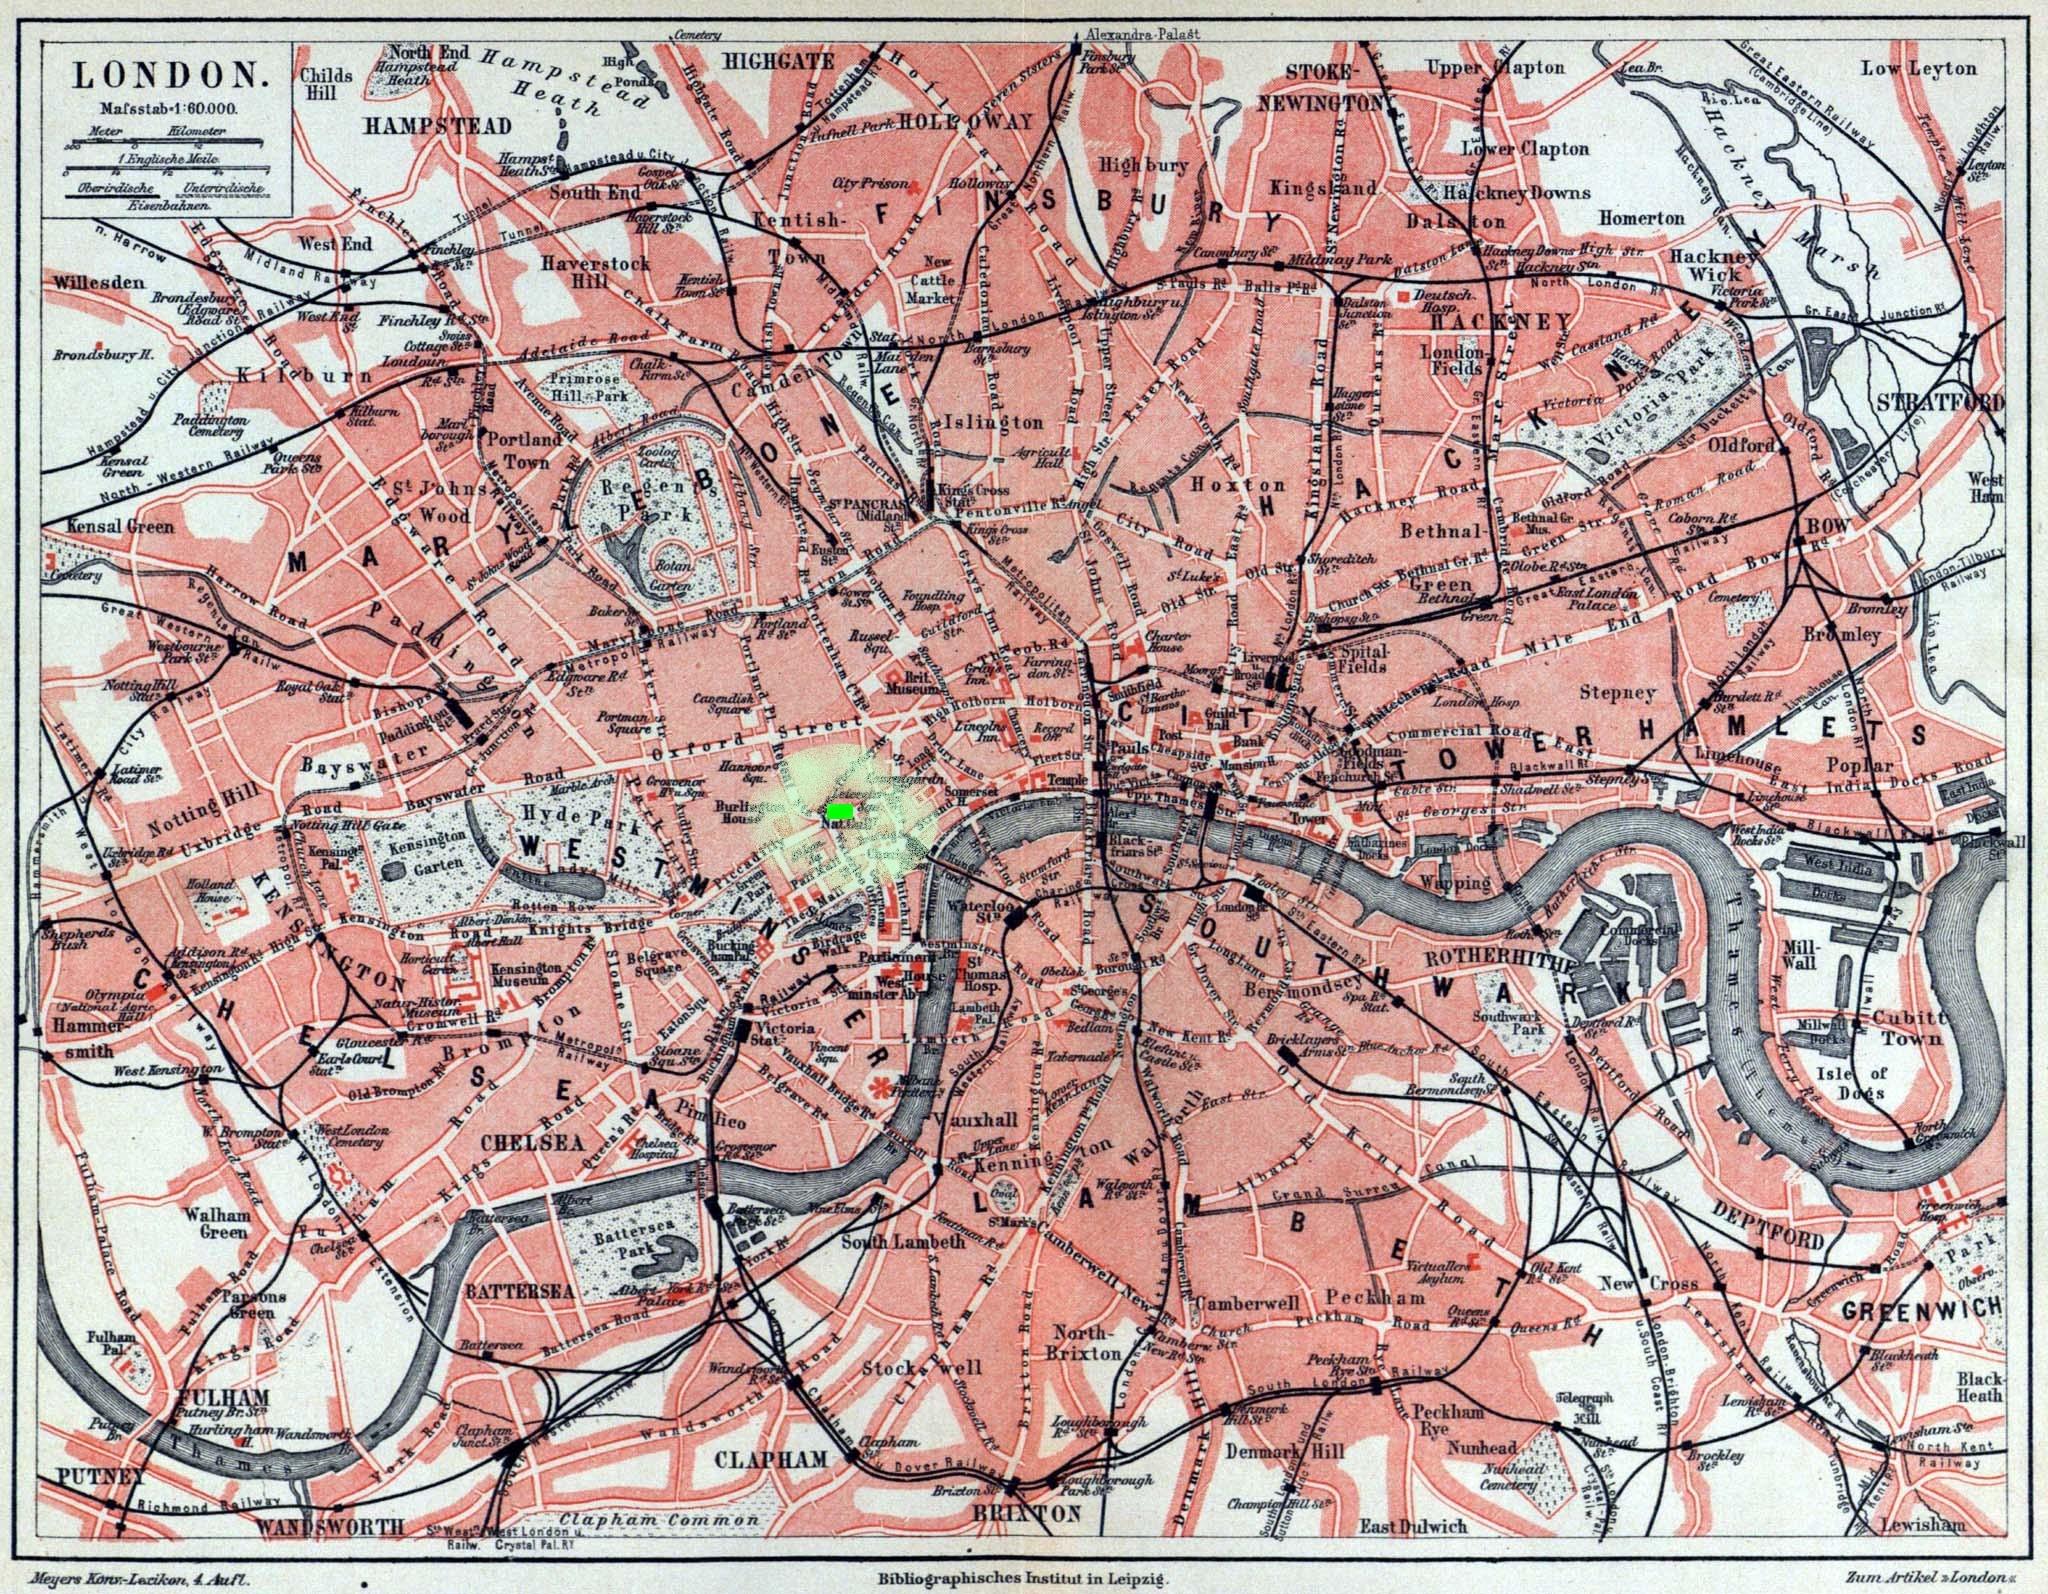 draycott hotel piccadilly map